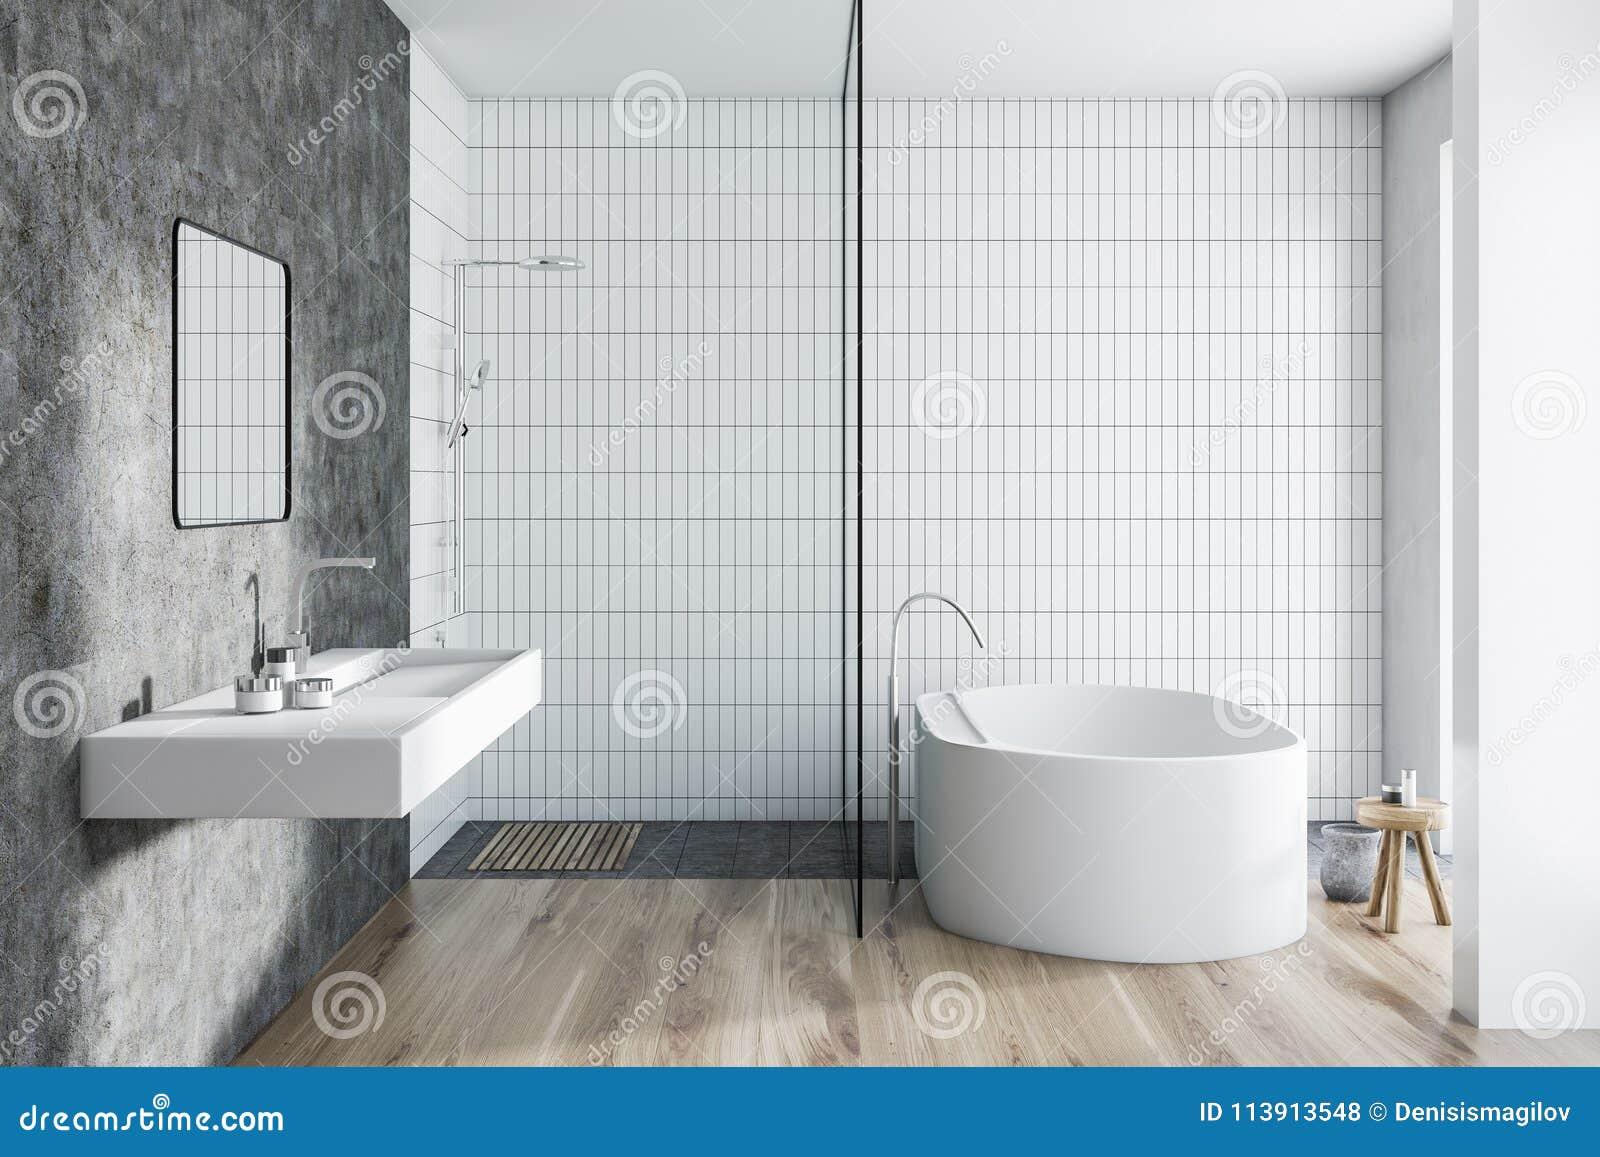 White Tile Bathroom Interior Stock Illustration - Illustration of ...